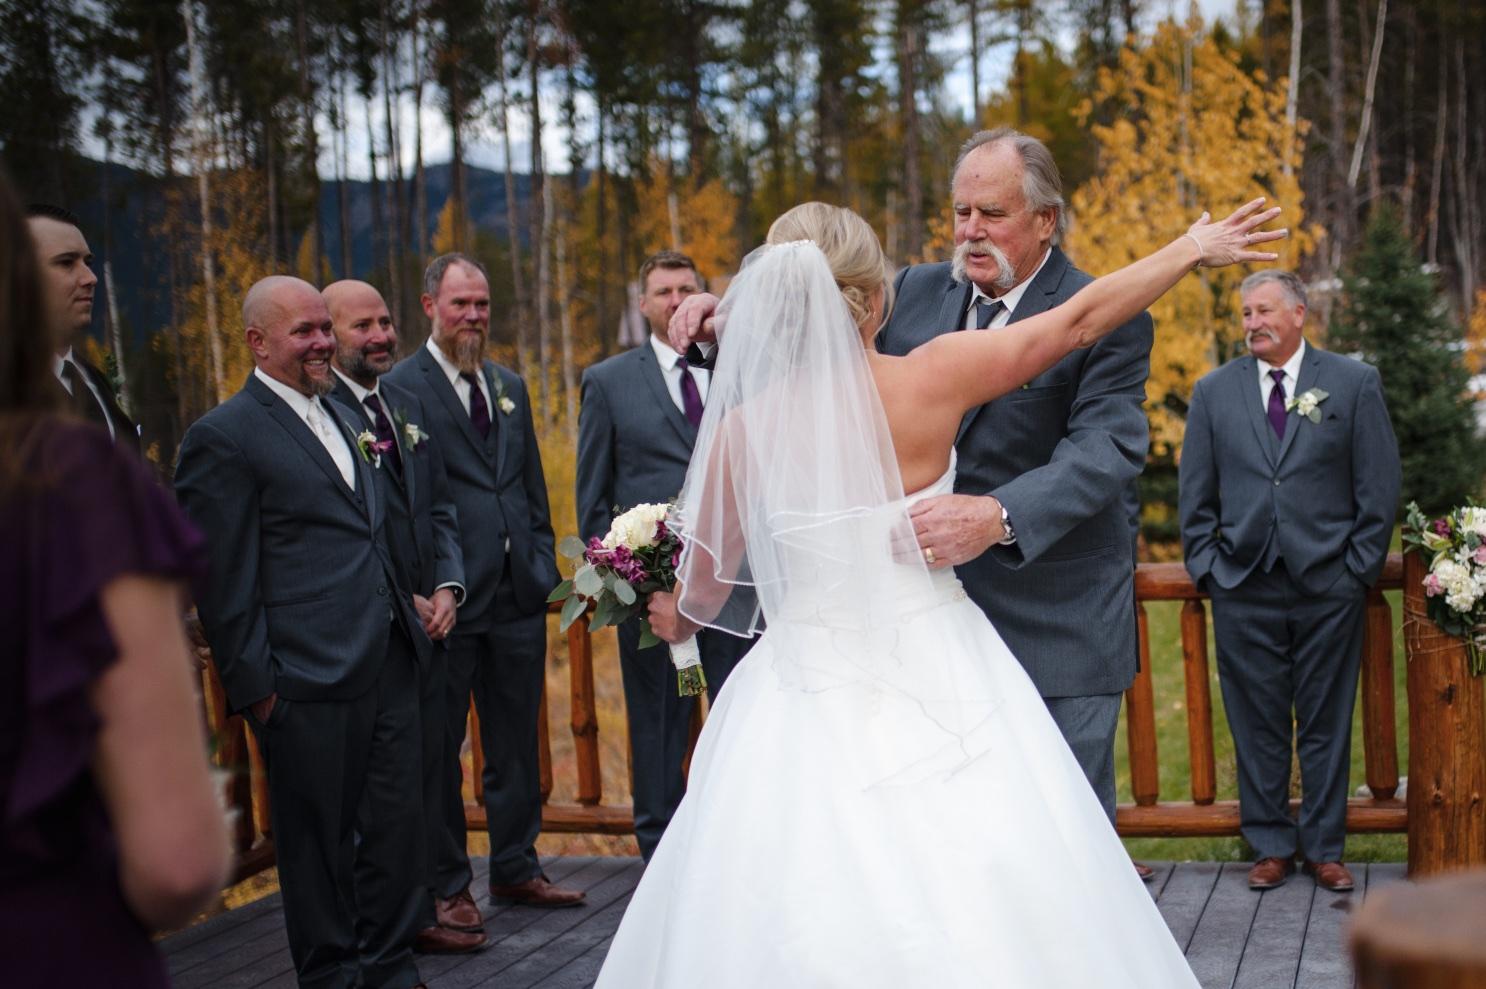 lindseyjane_wedding056.jpg